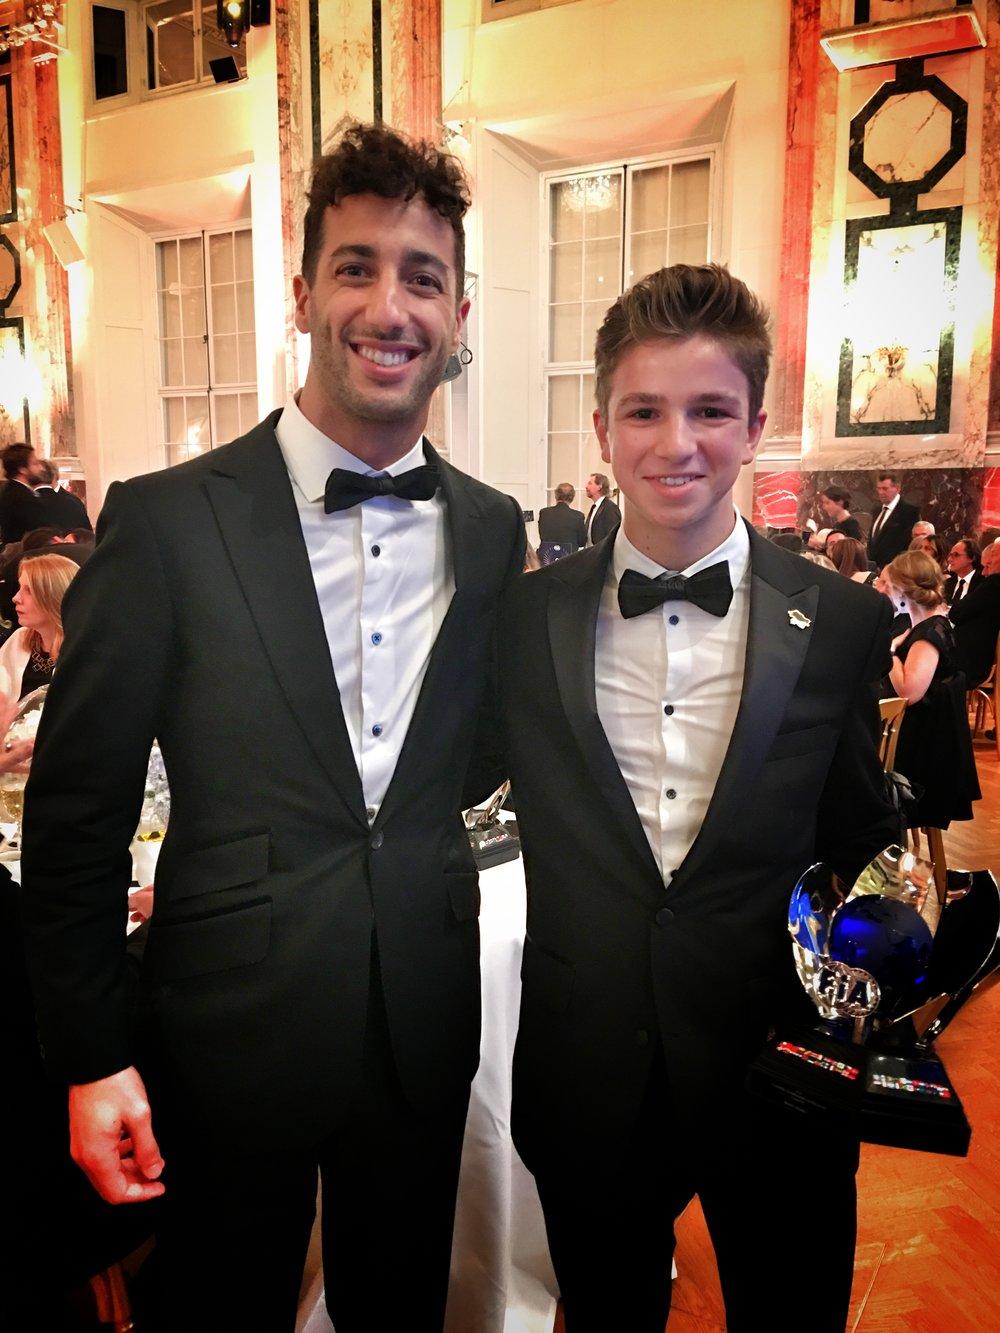 Daniel Ricciardo (RedBull F1 Driver) and Bruno Carneiro (UMC MiTime Racing)